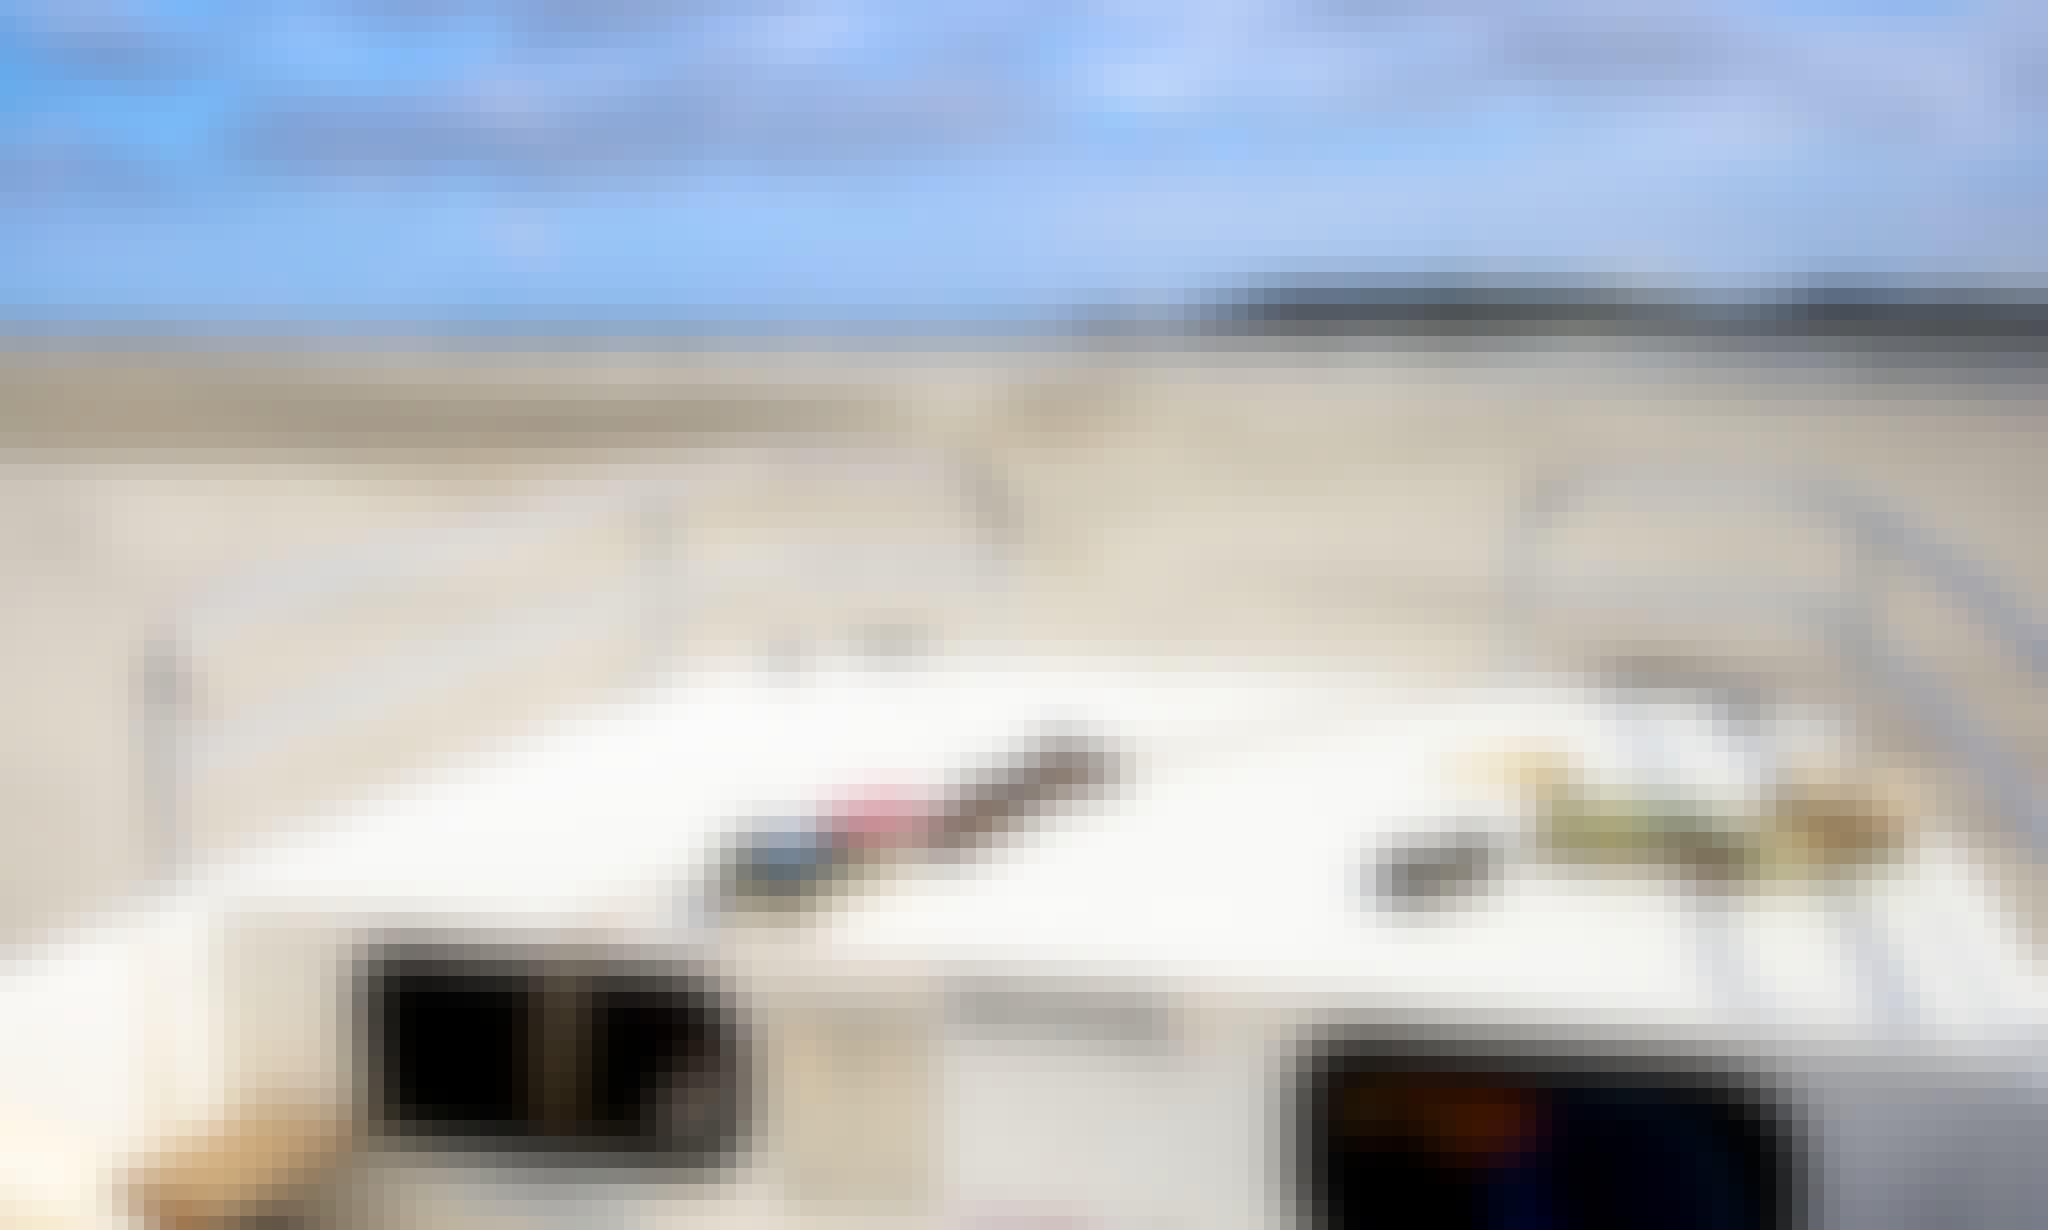 24ft, 12 Center Console Charter in Folly Beach, South Carolina